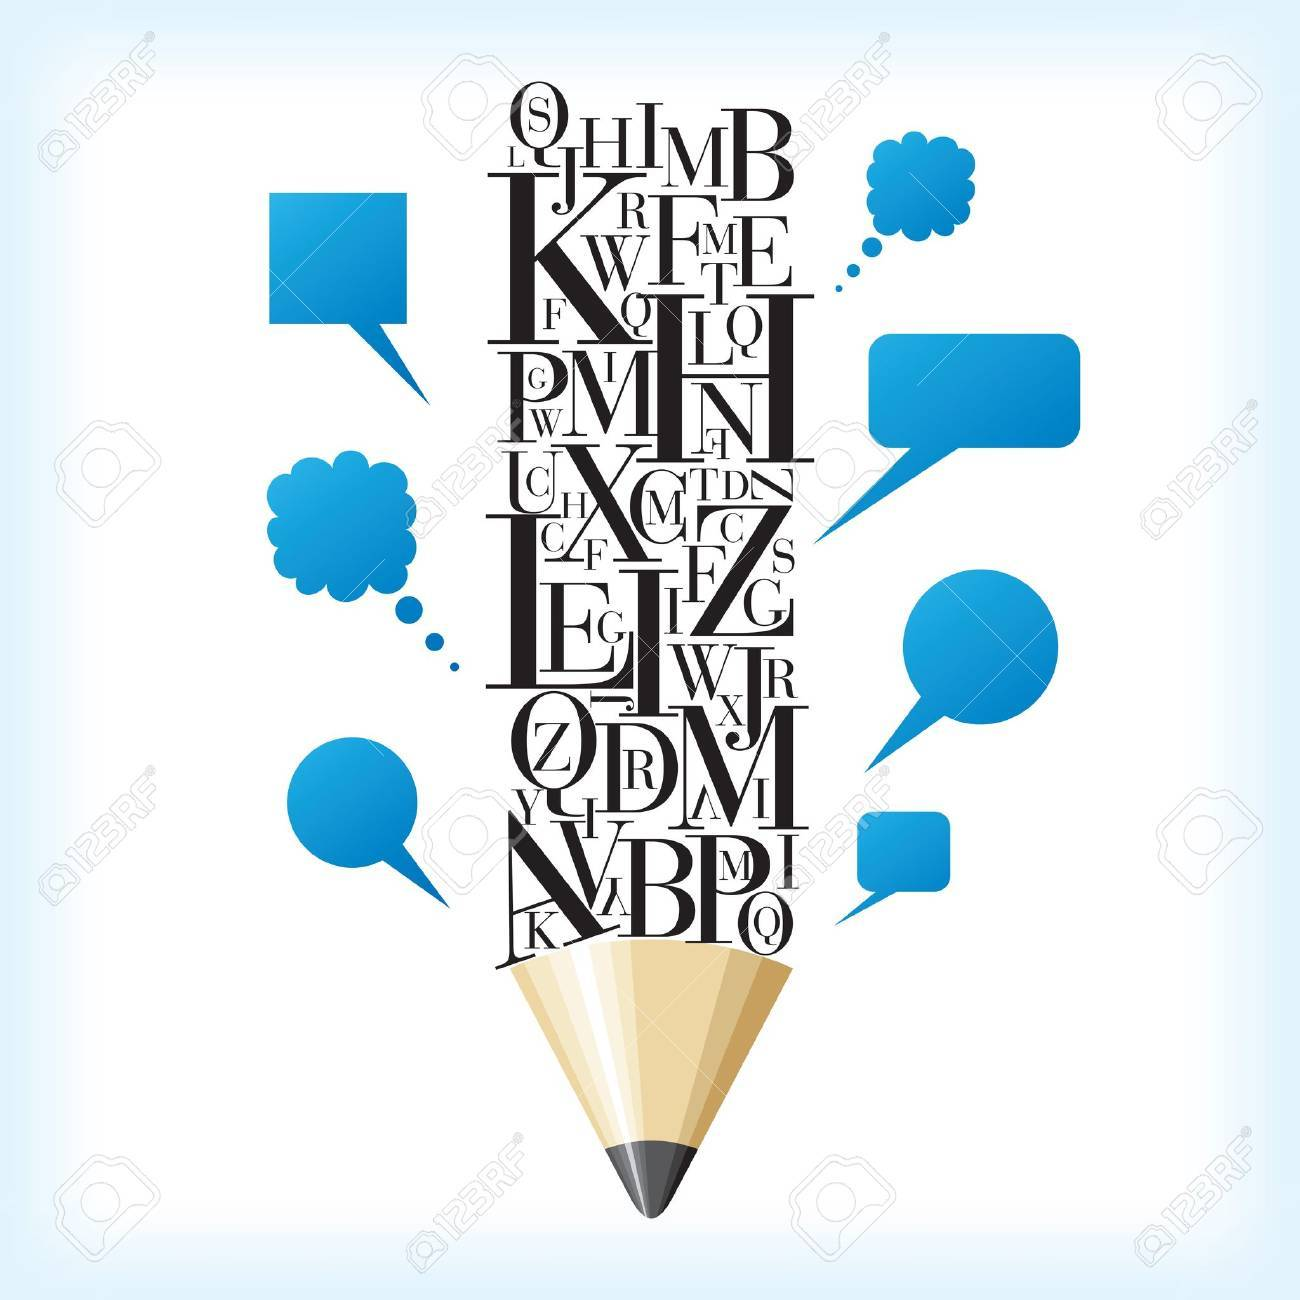 alphabetic pencil with speech bubble Stock Vector - 17752096